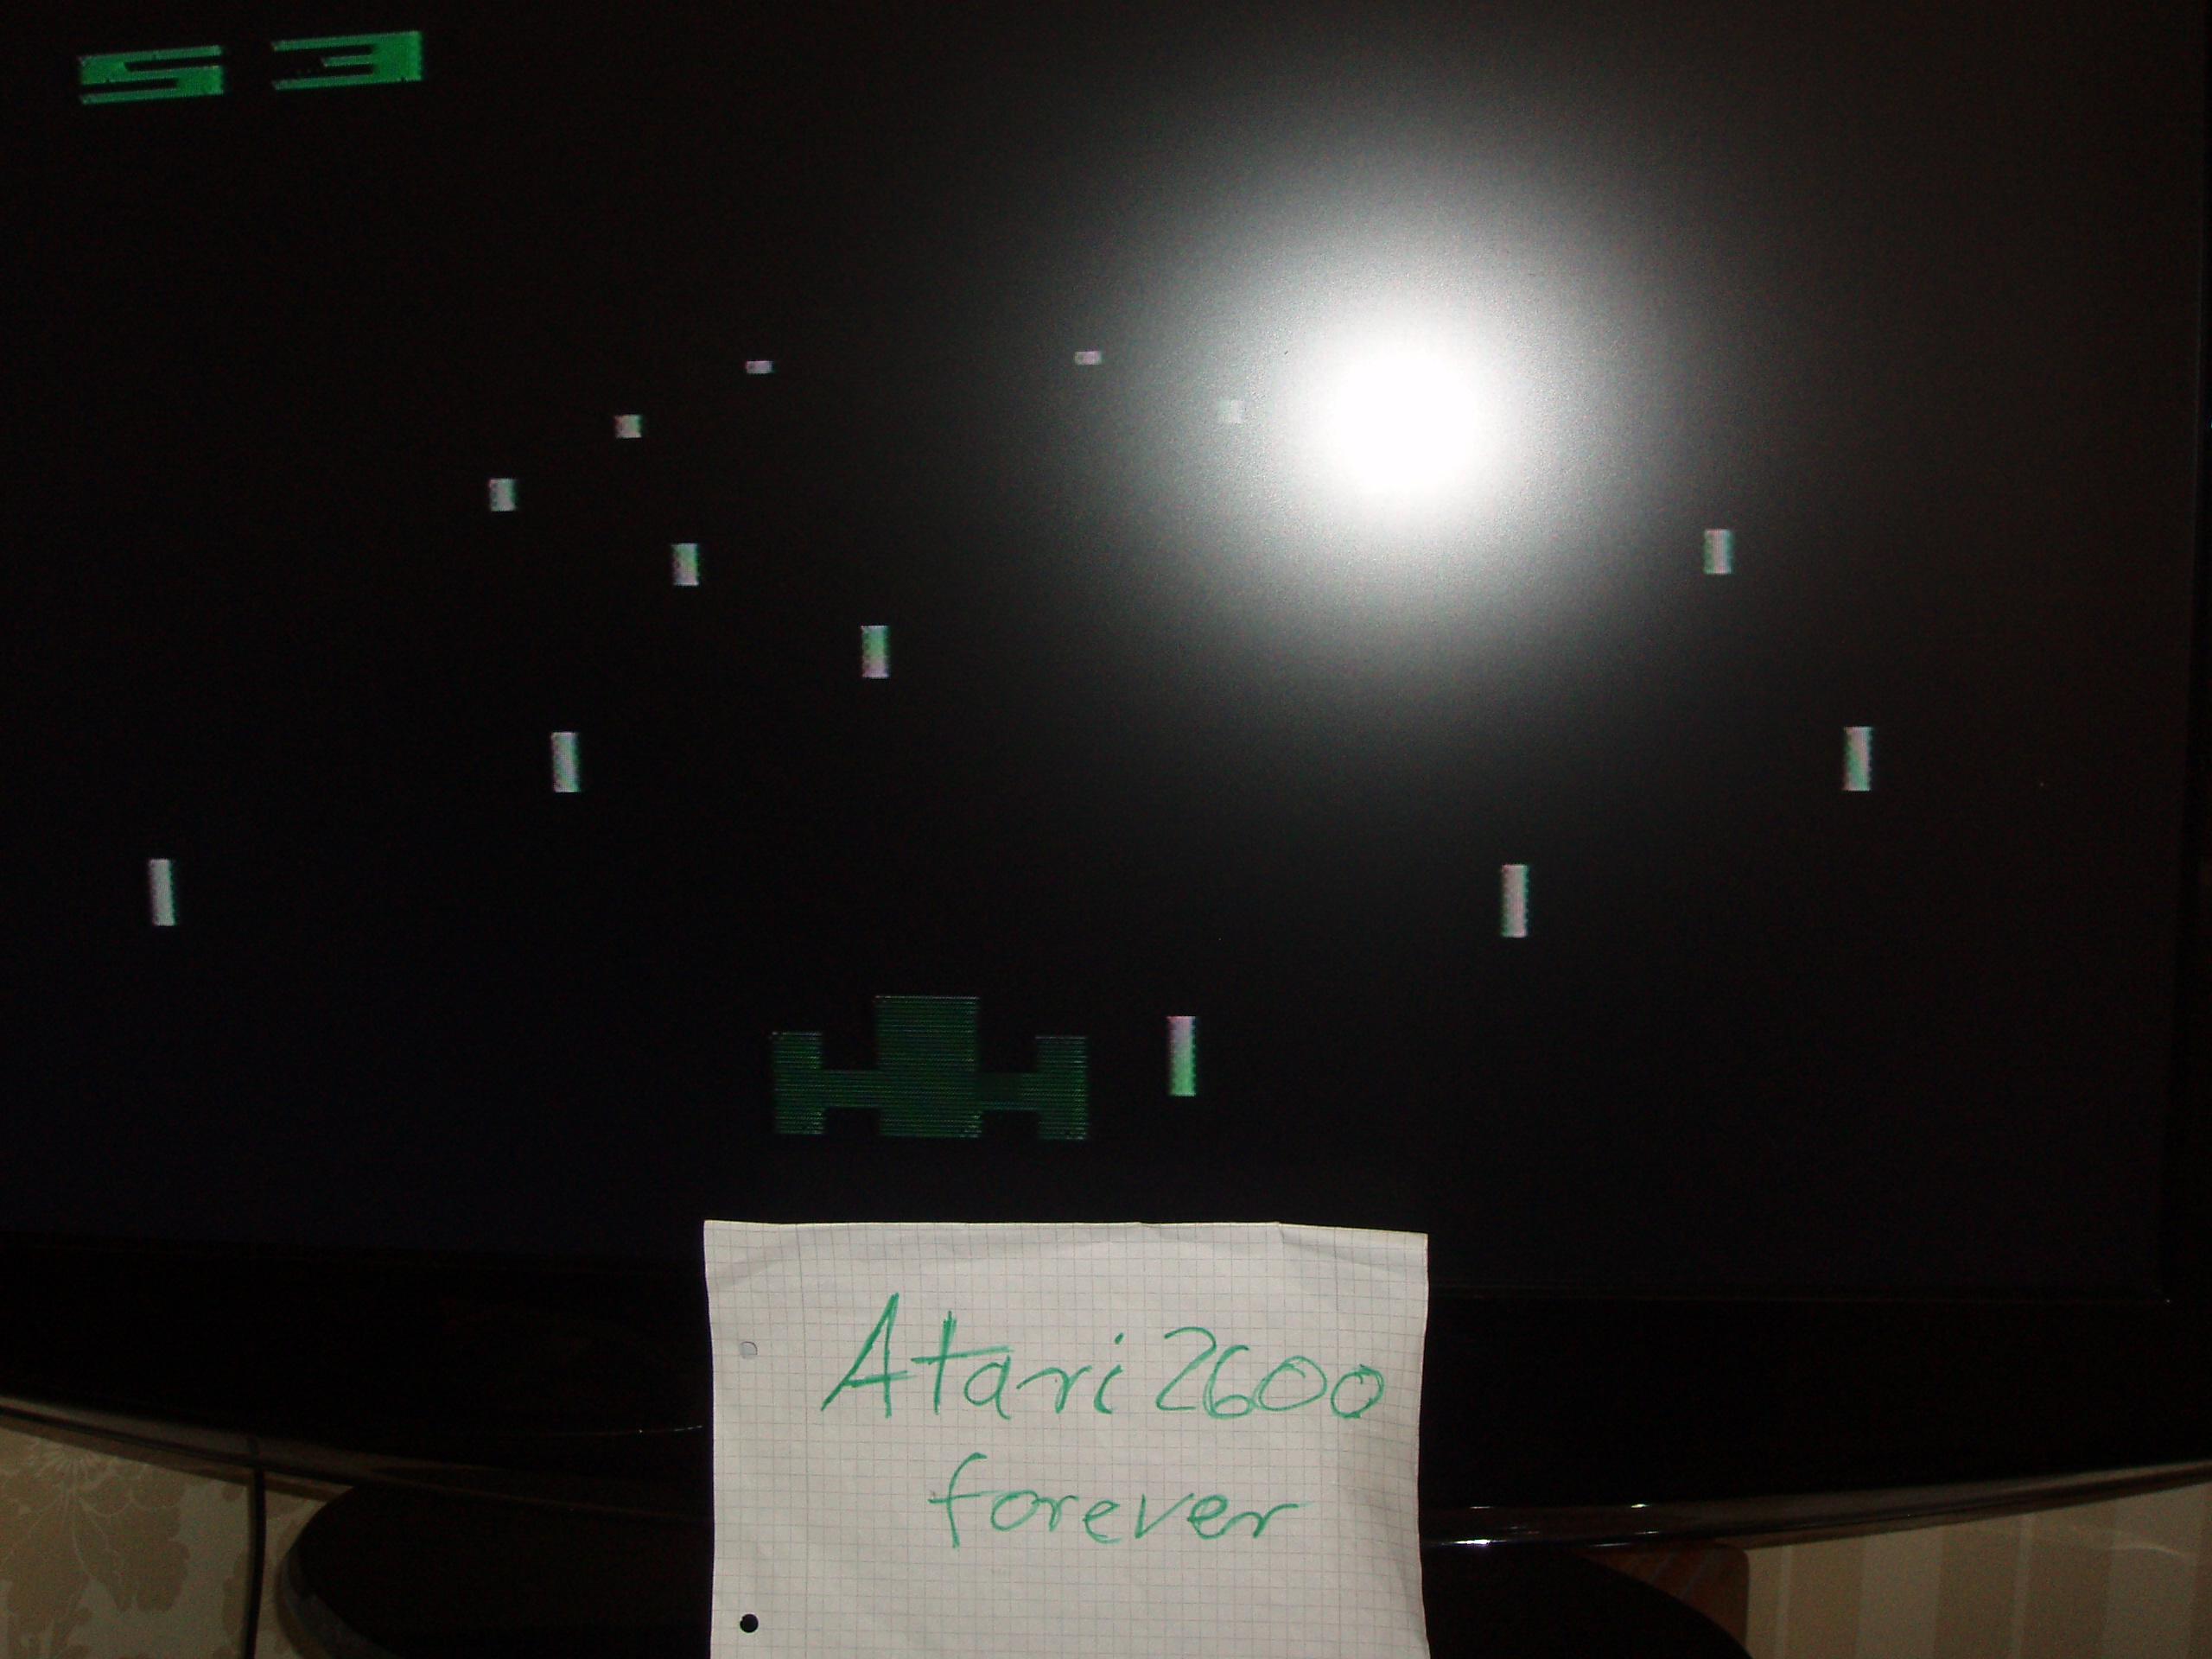 atari2600forever: Night Driver (Atari 2600 Novice/B) 53 points on 2016-04-25 10:06:32